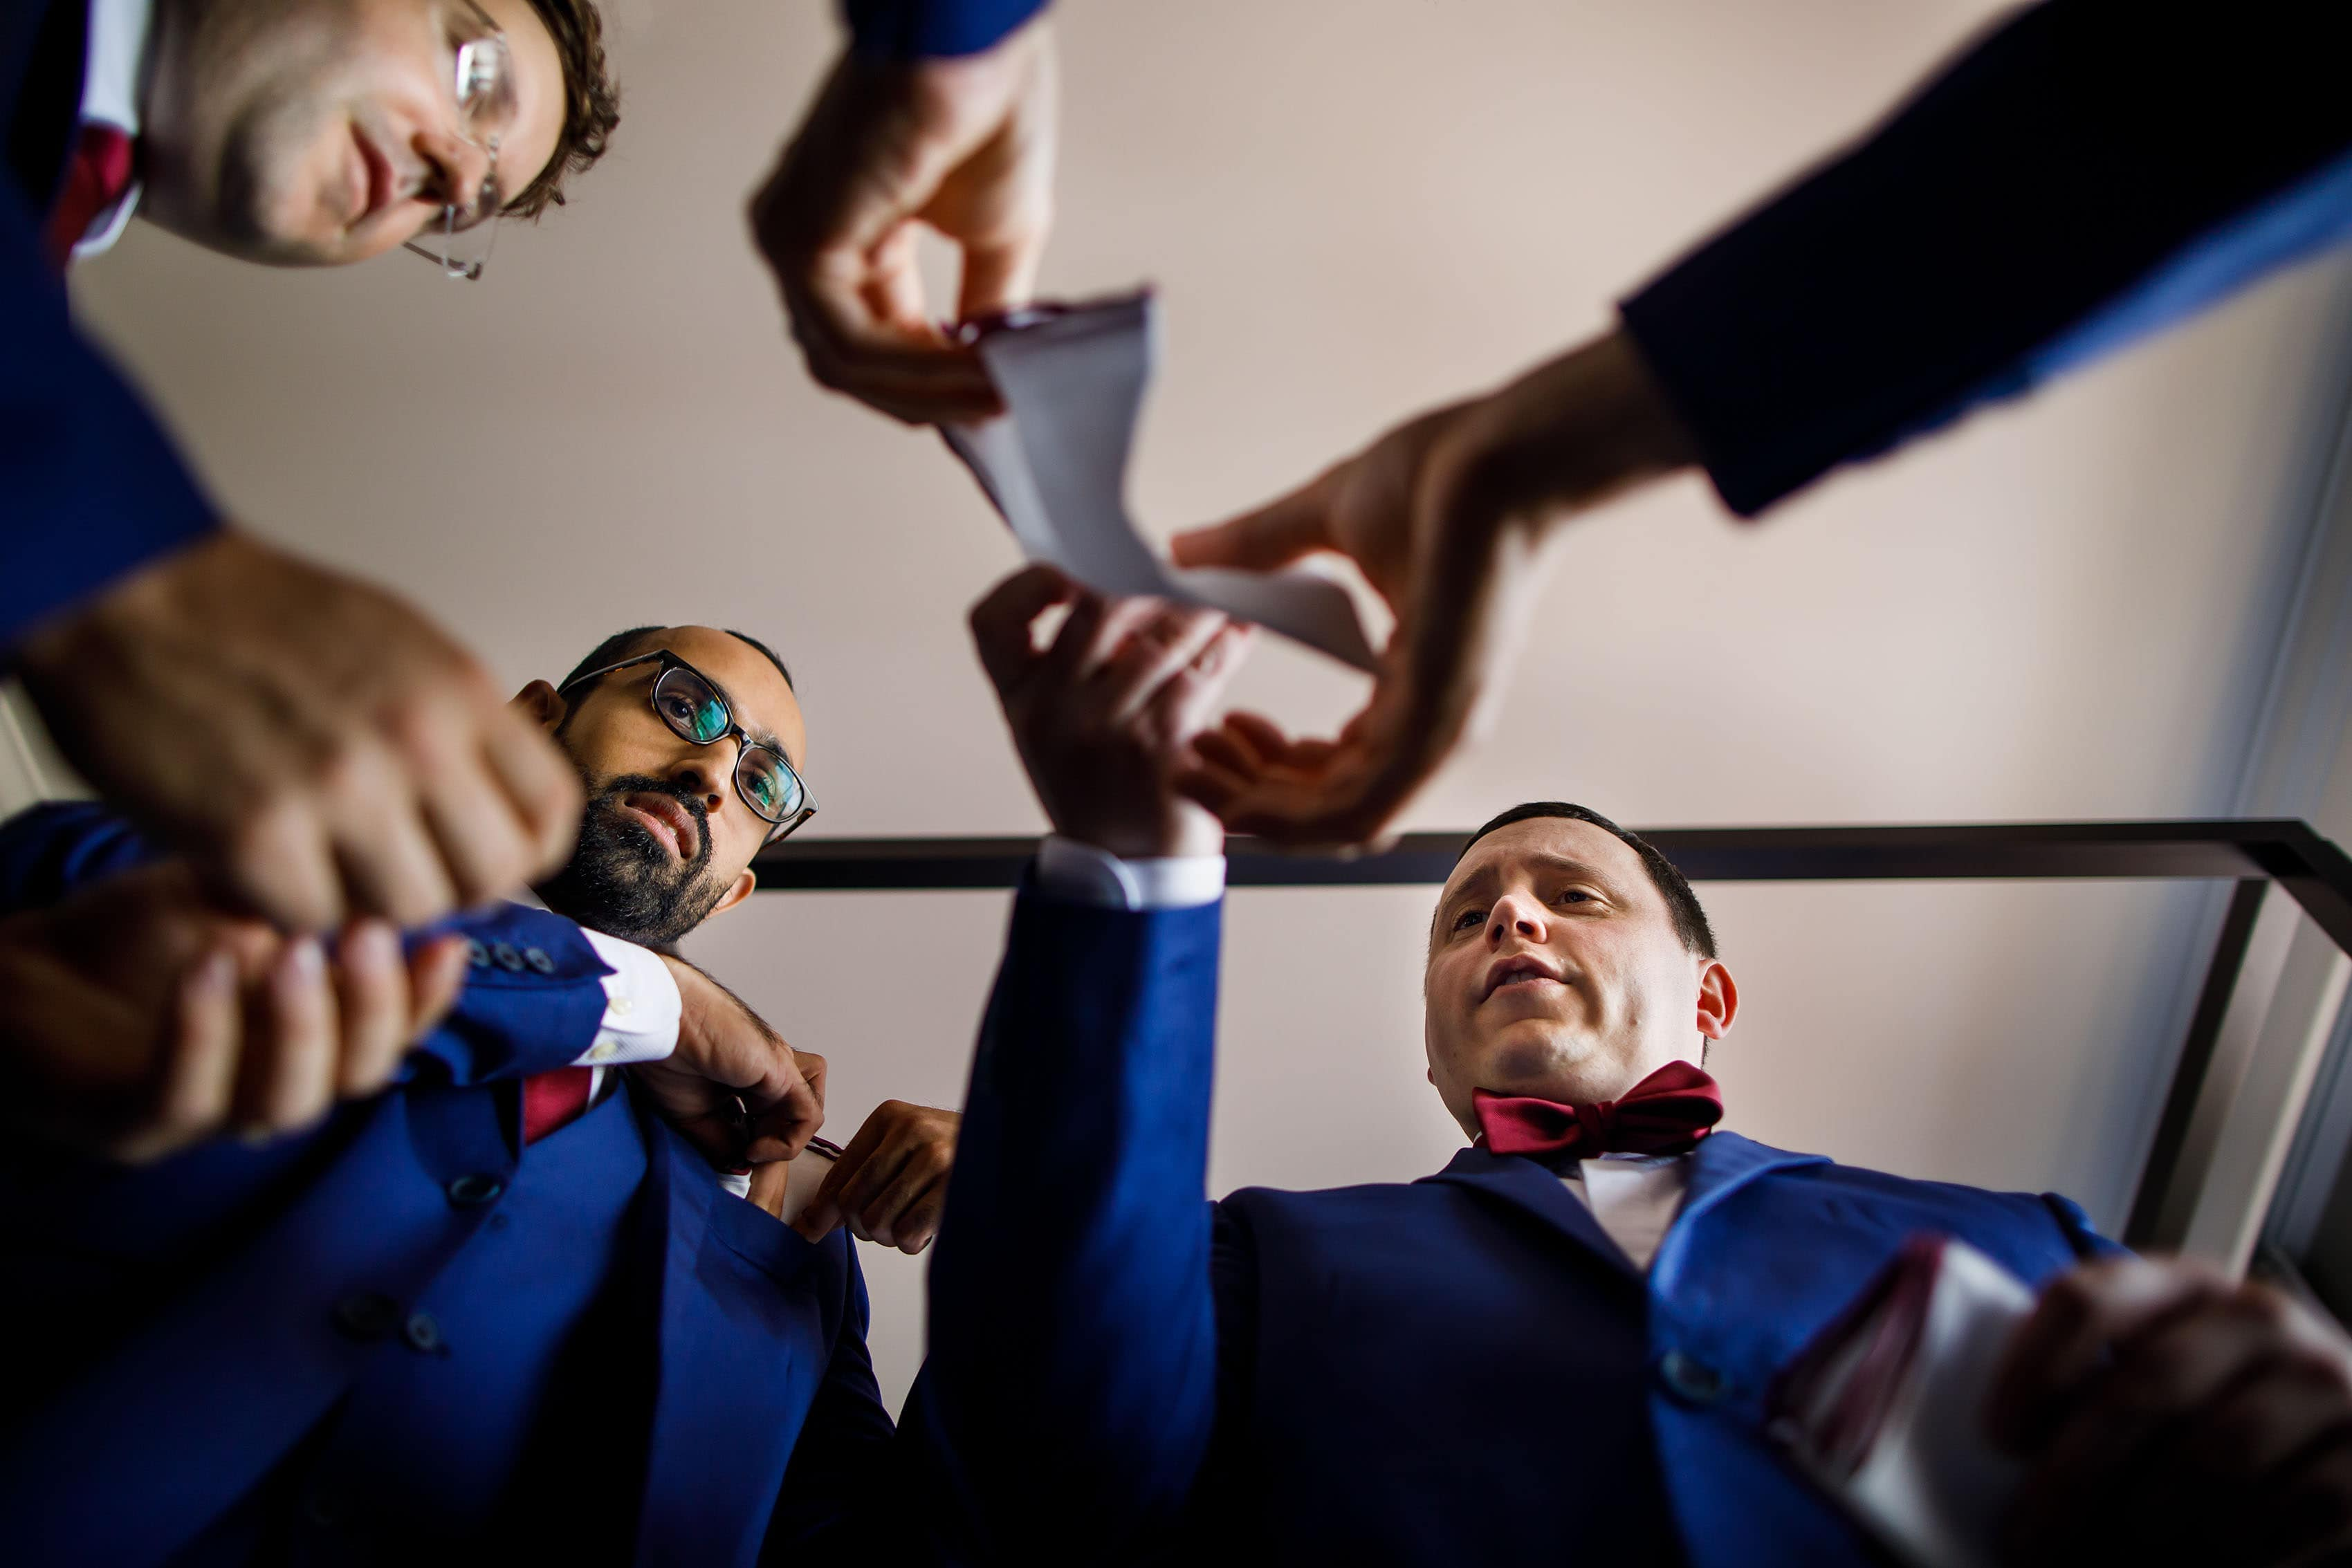 The groom and groomsmen adjust pocket squares at La Banque hotel